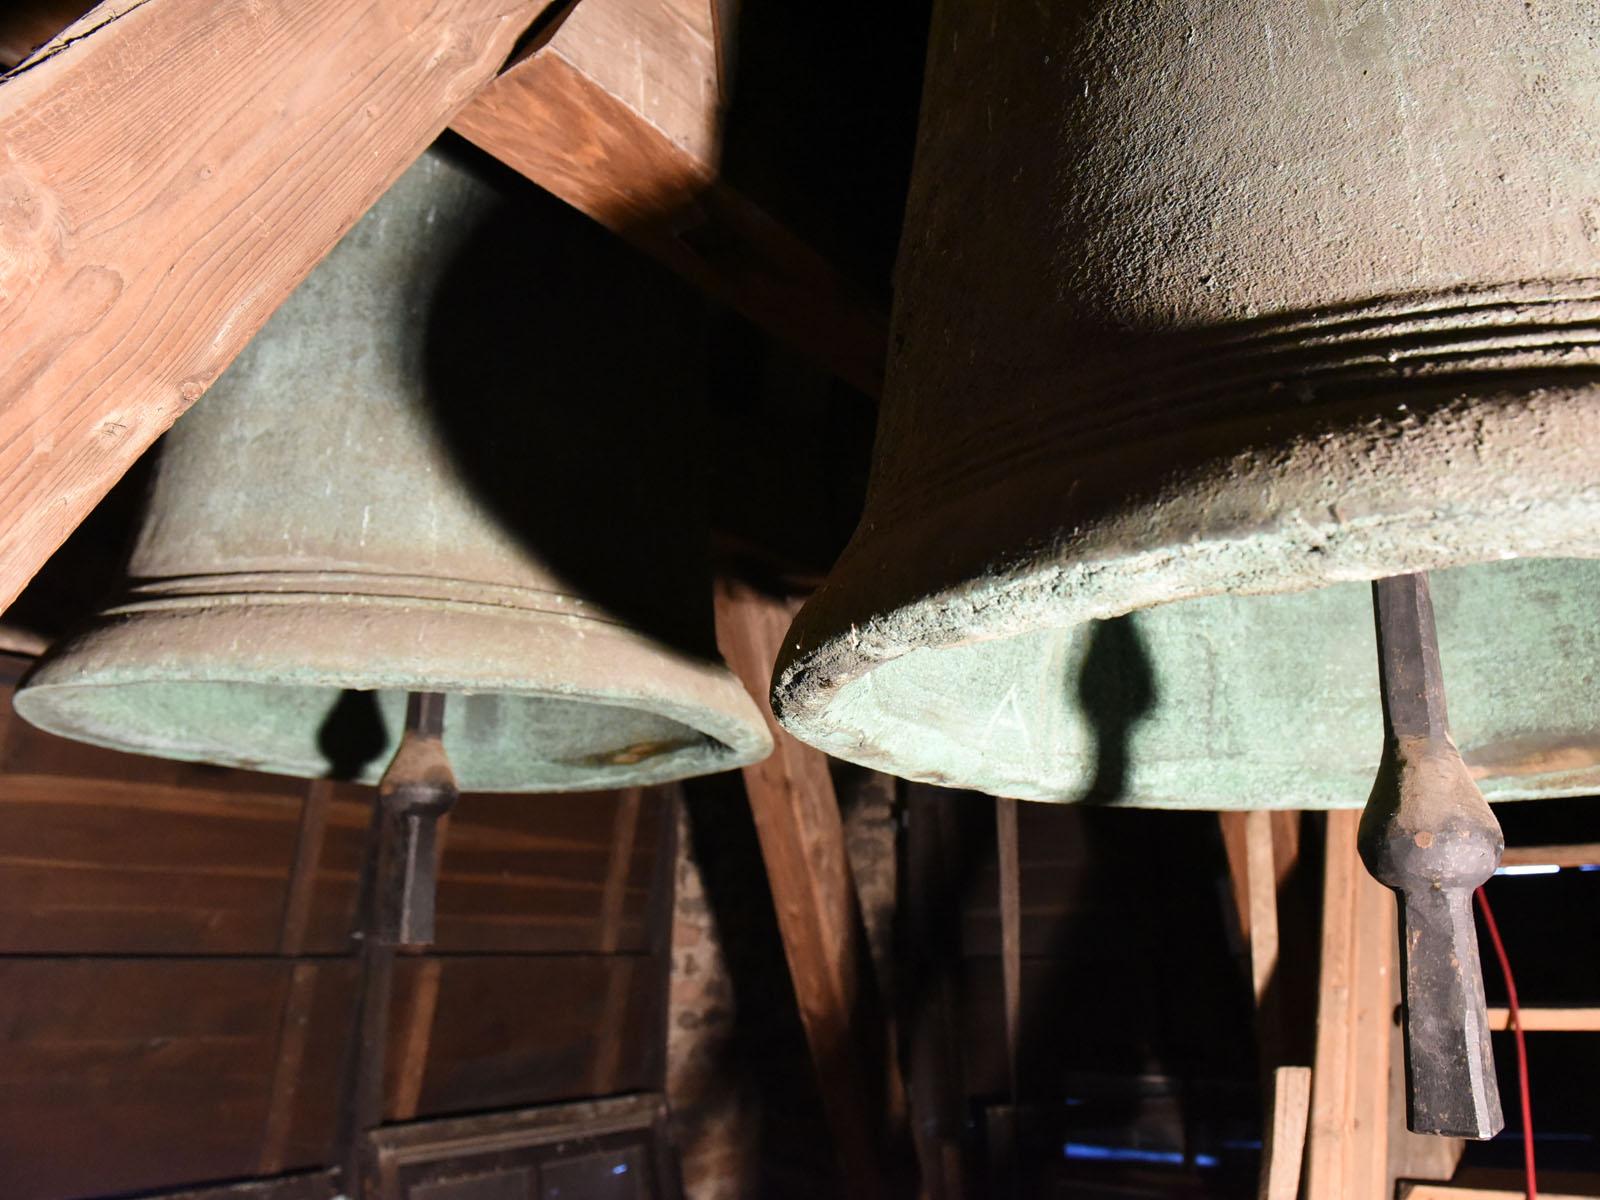 Glockenstuhl im Nordturm des Hohen Doms (Foto: Nicolas Schnall / pba)